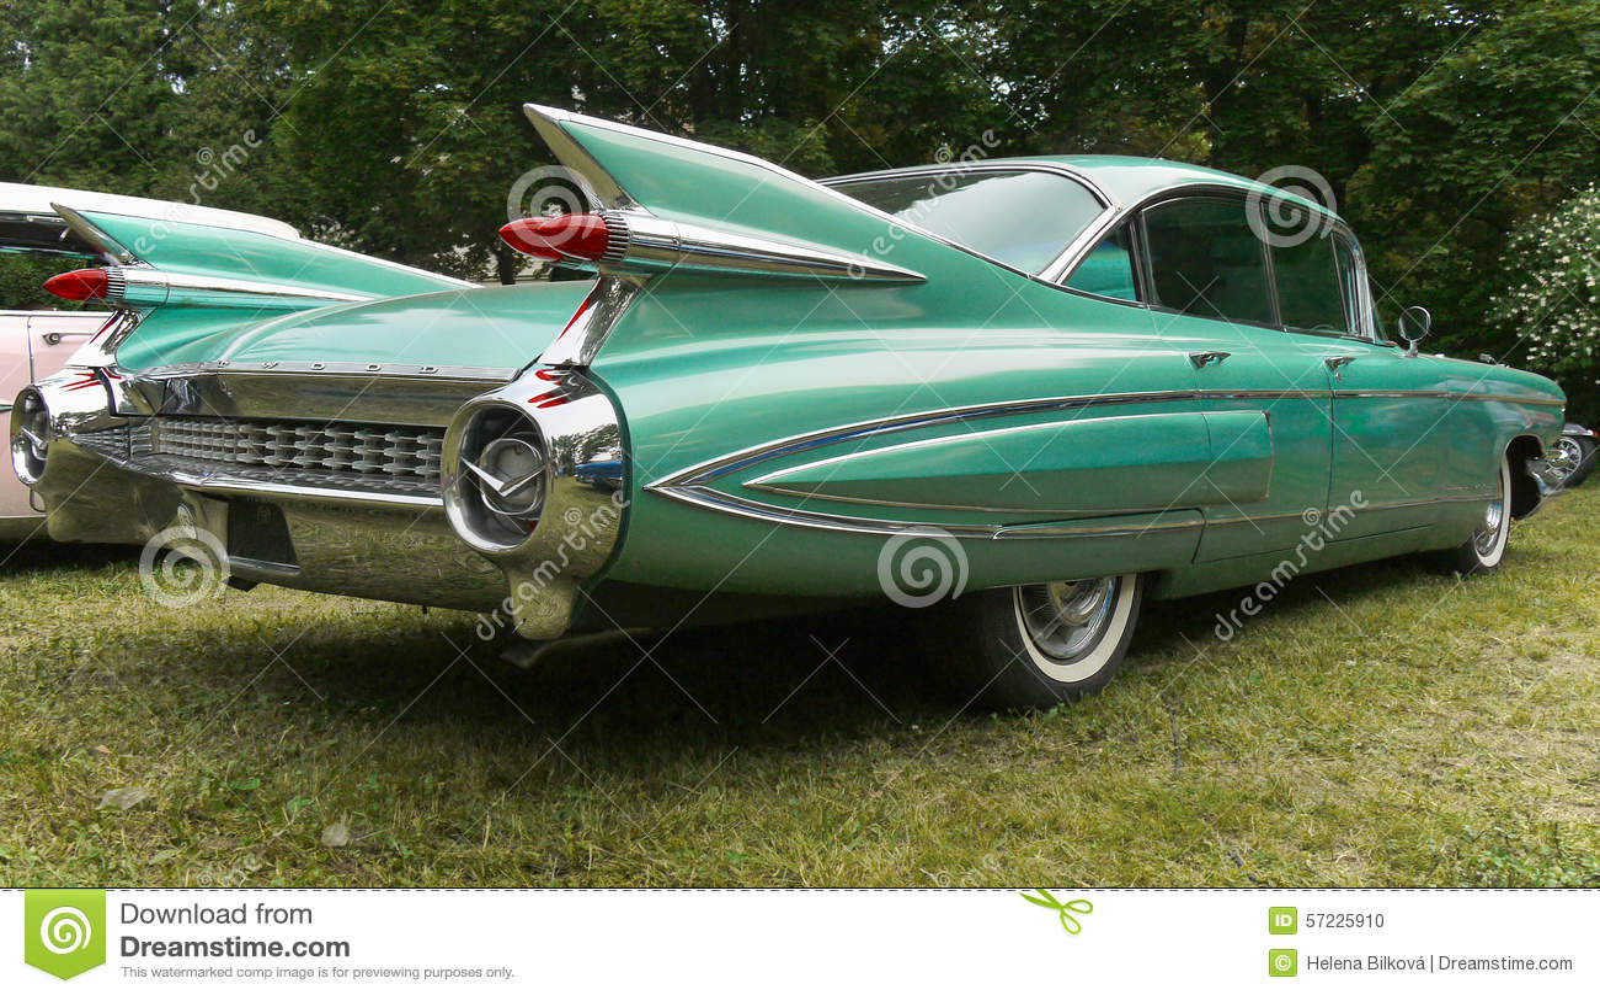 James Wood Auto Group Denton Chevrolet Buick Cadillac